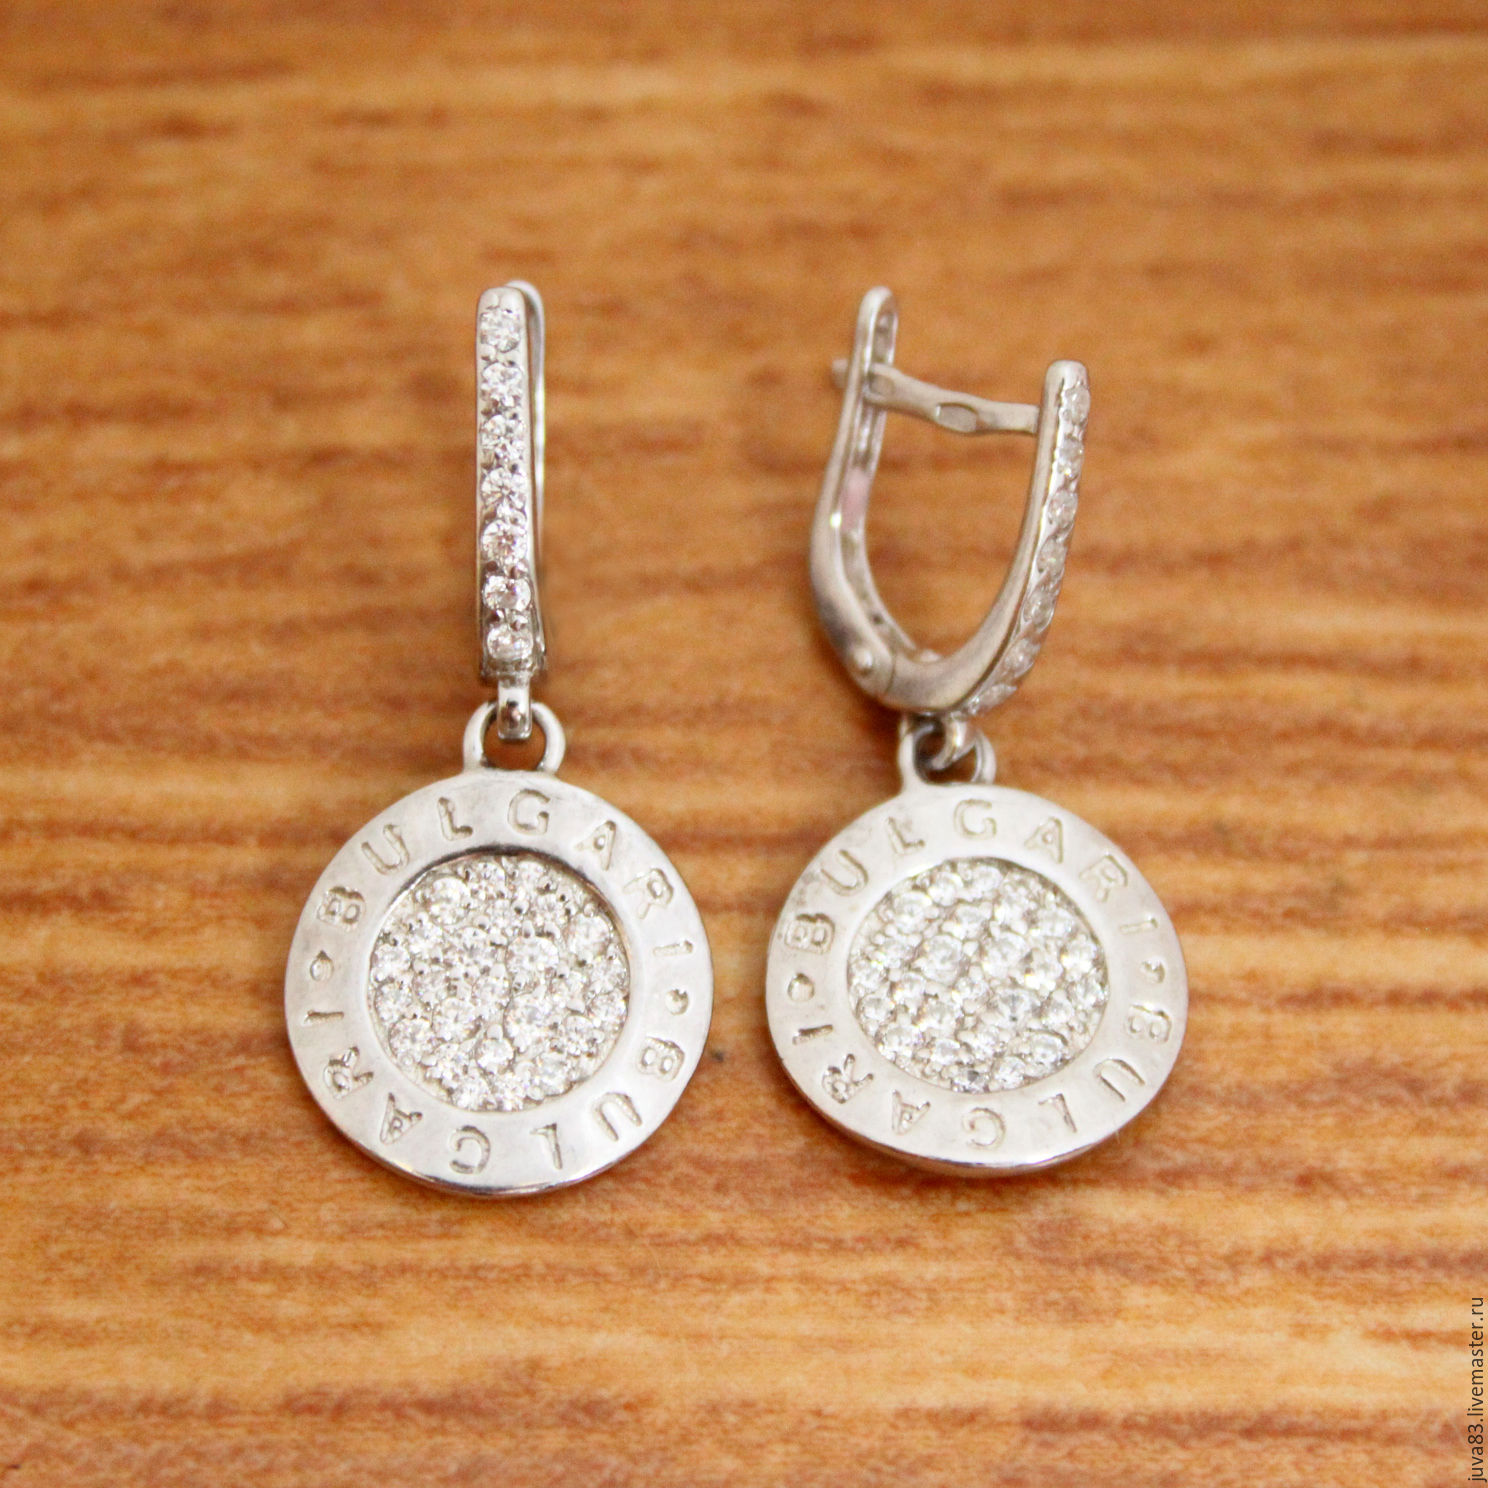 47158bf3b0ca Серебряные серьги Bulgari, реплика, серебро 925